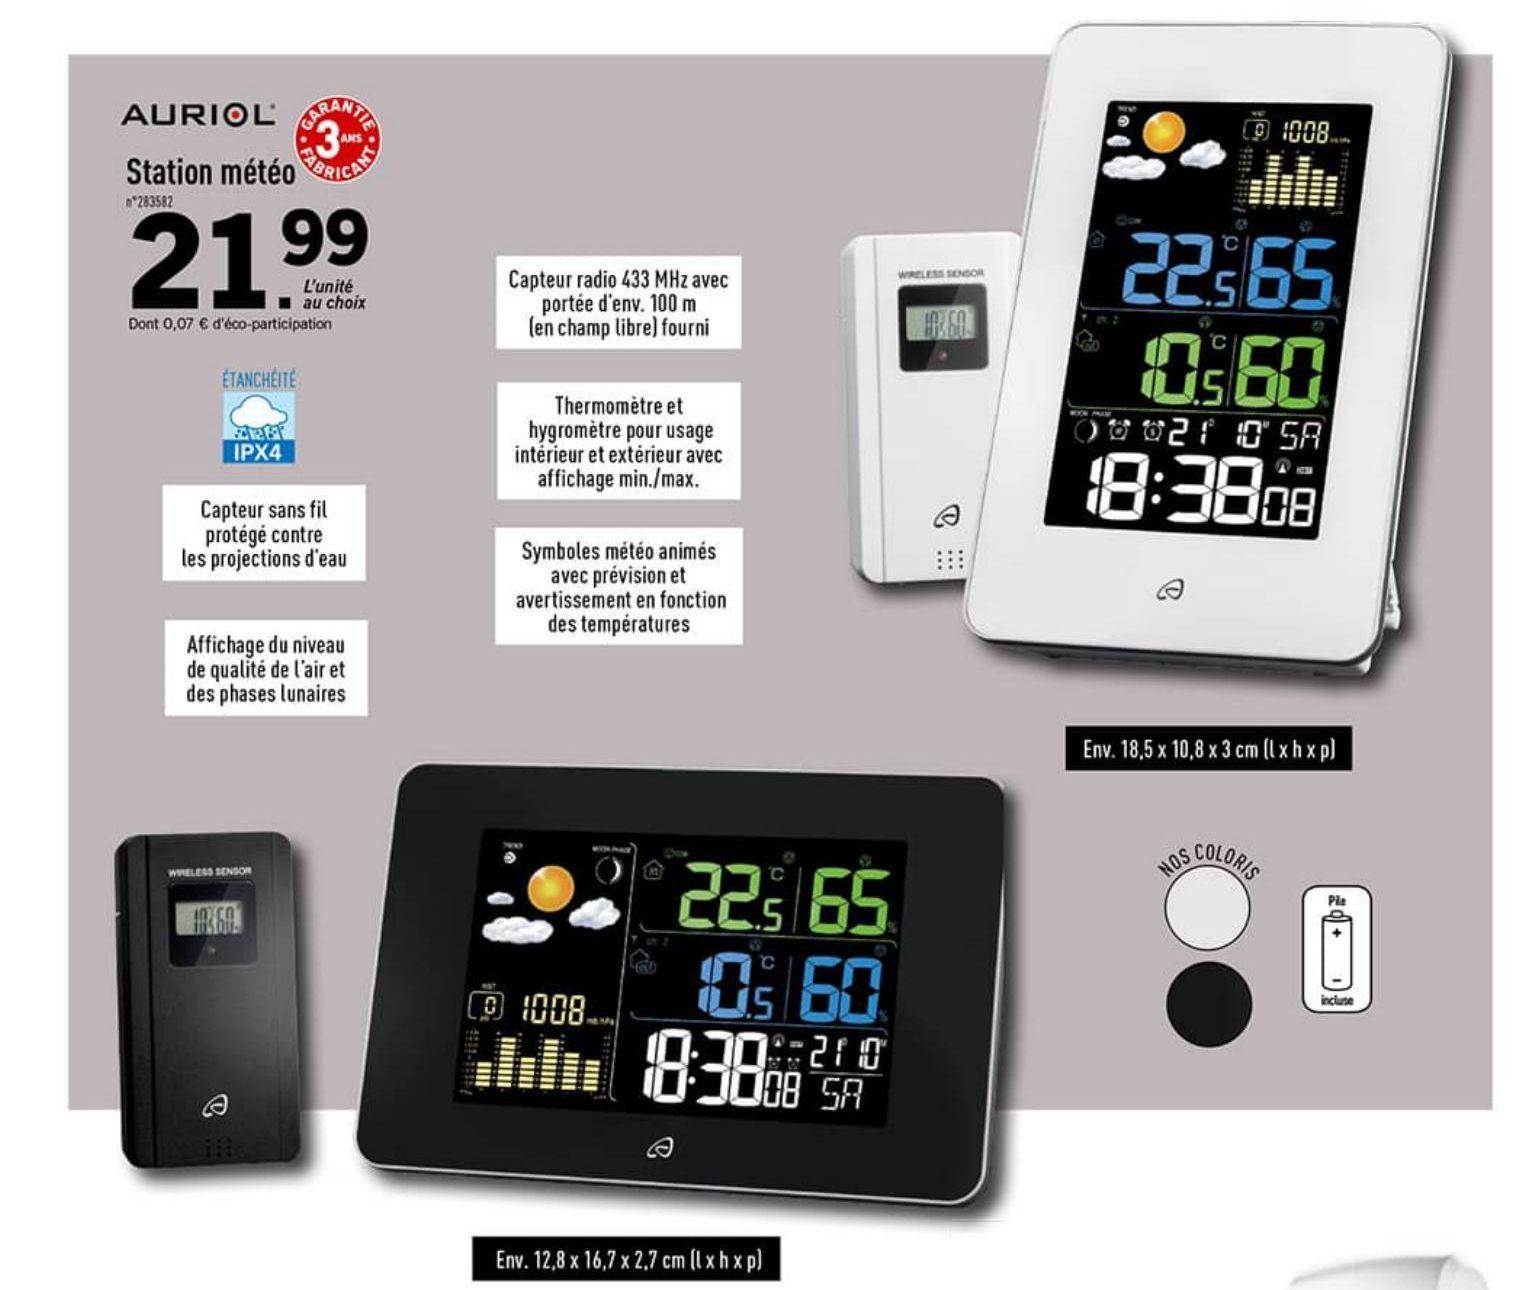 Station météo radio Auriol - Blanc / Noir